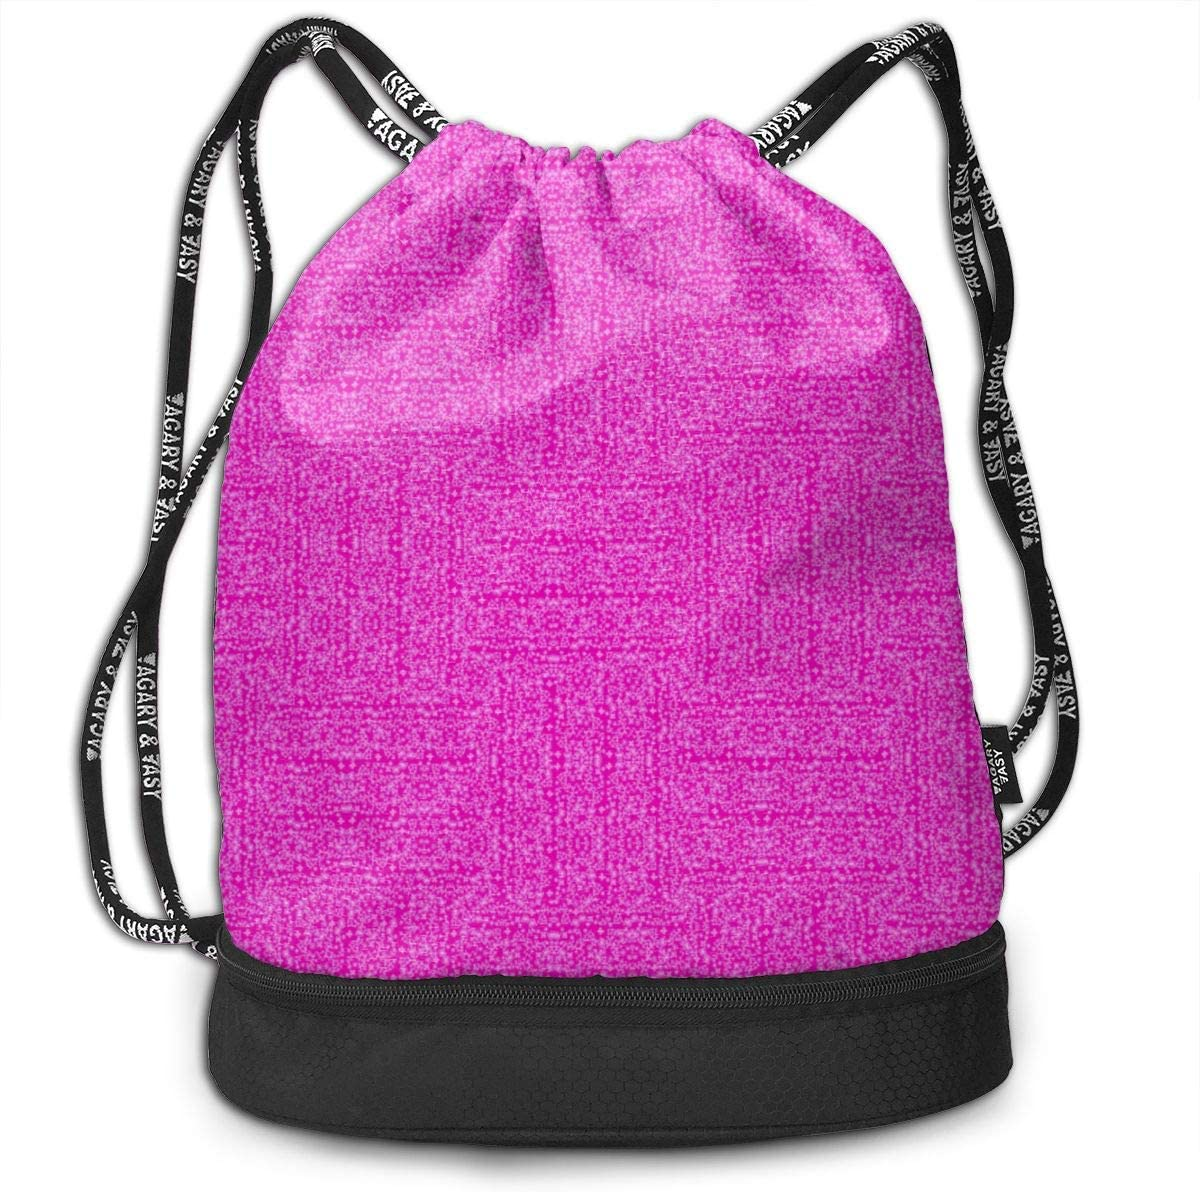 Pink Pink Basketweave Drawstring Backpack Sports Athletic Gym Cinch Sack String Storage Bags for Hiking Travel Beach